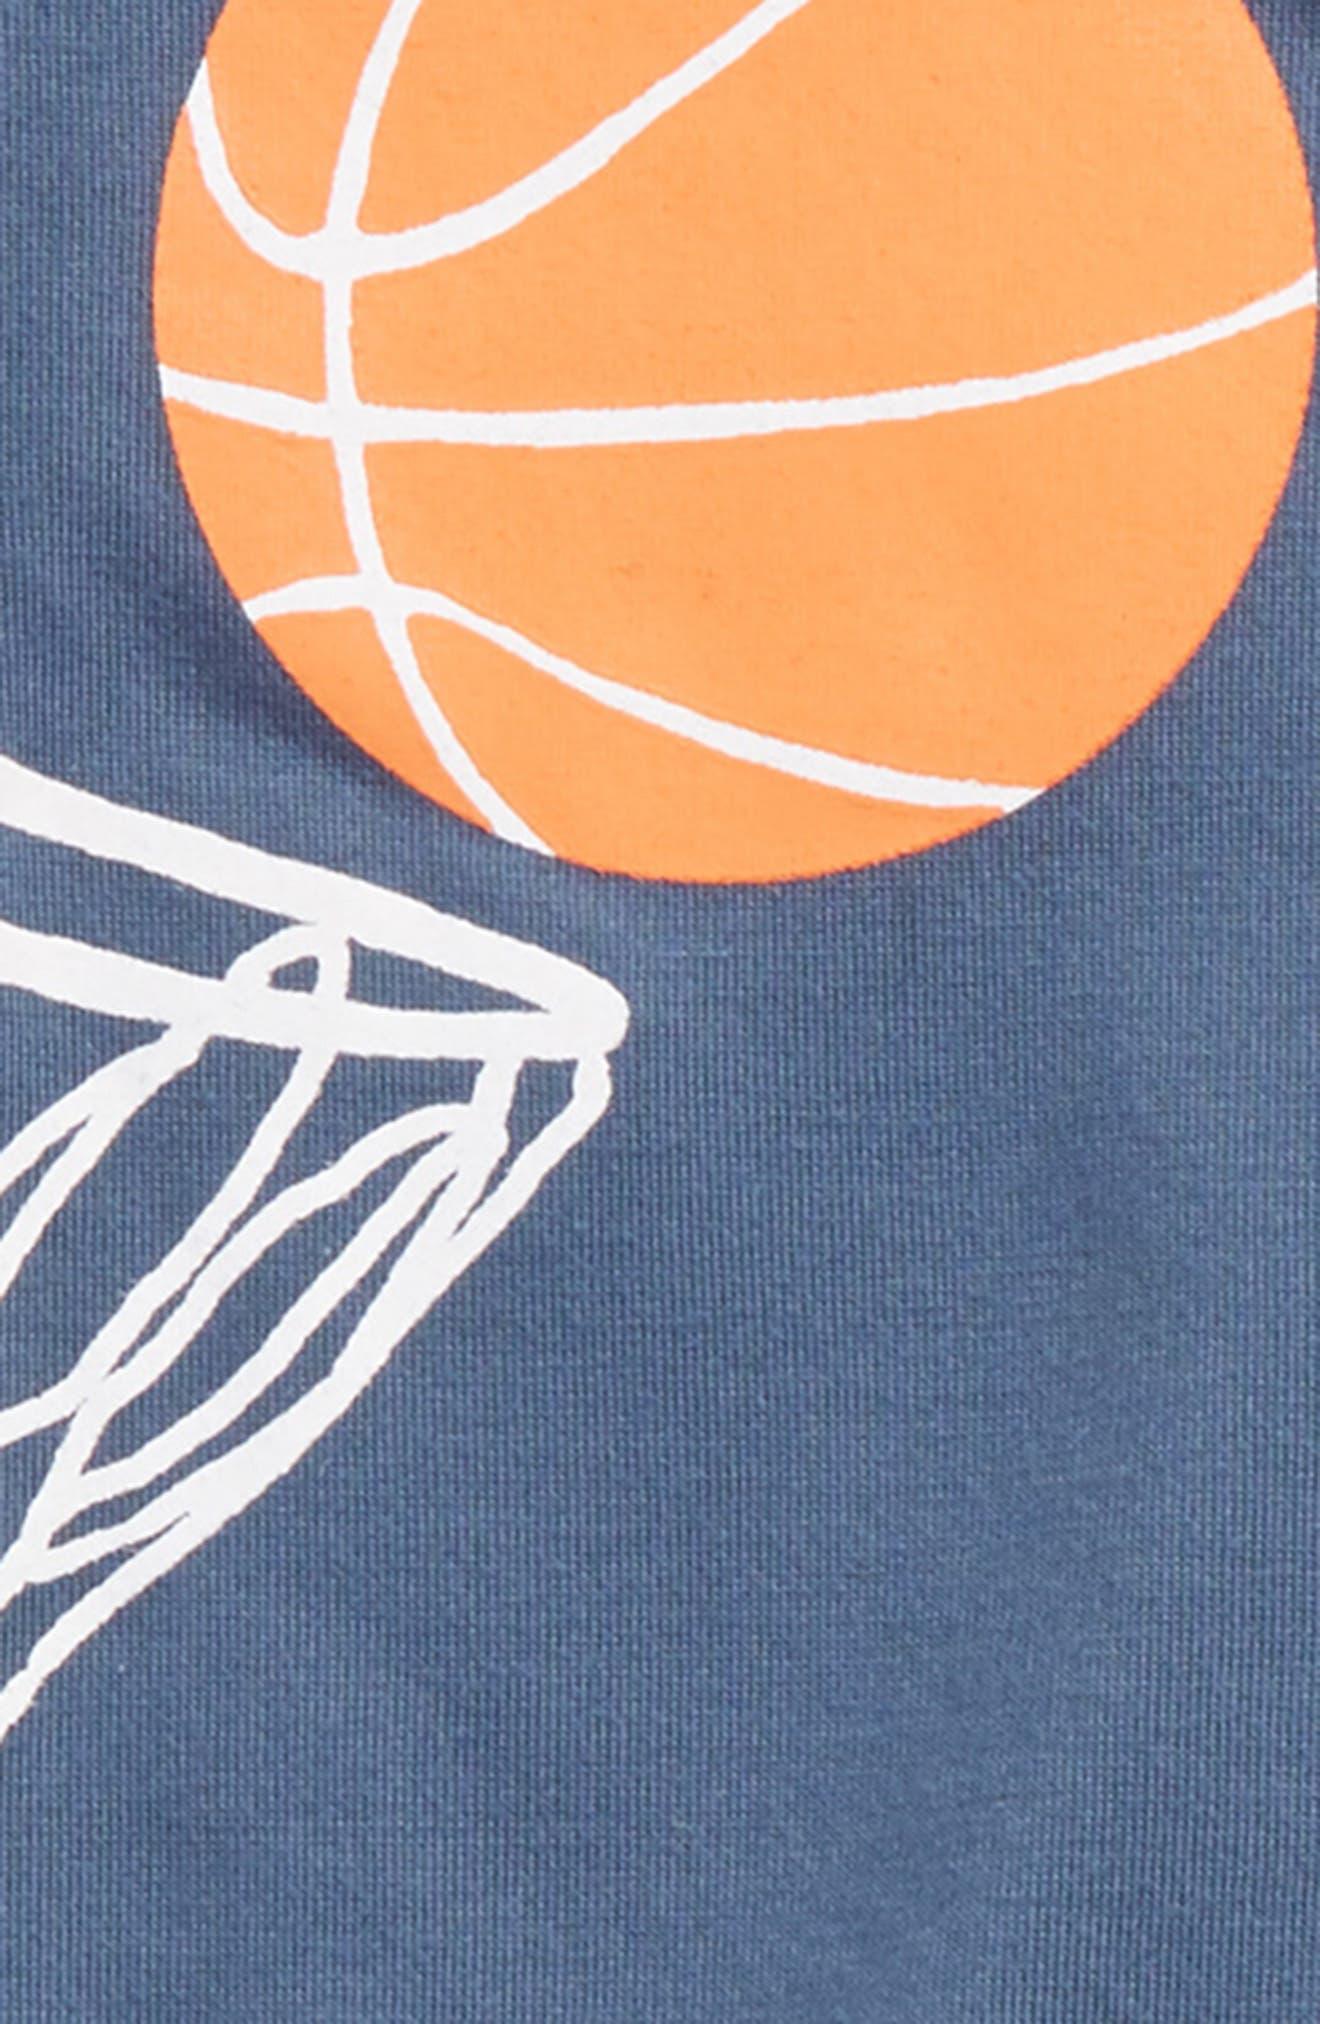 Yum Yum Two-Piece Pajamas,                             Alternate thumbnail 3, color,                             Blue Vintage Basket Swish